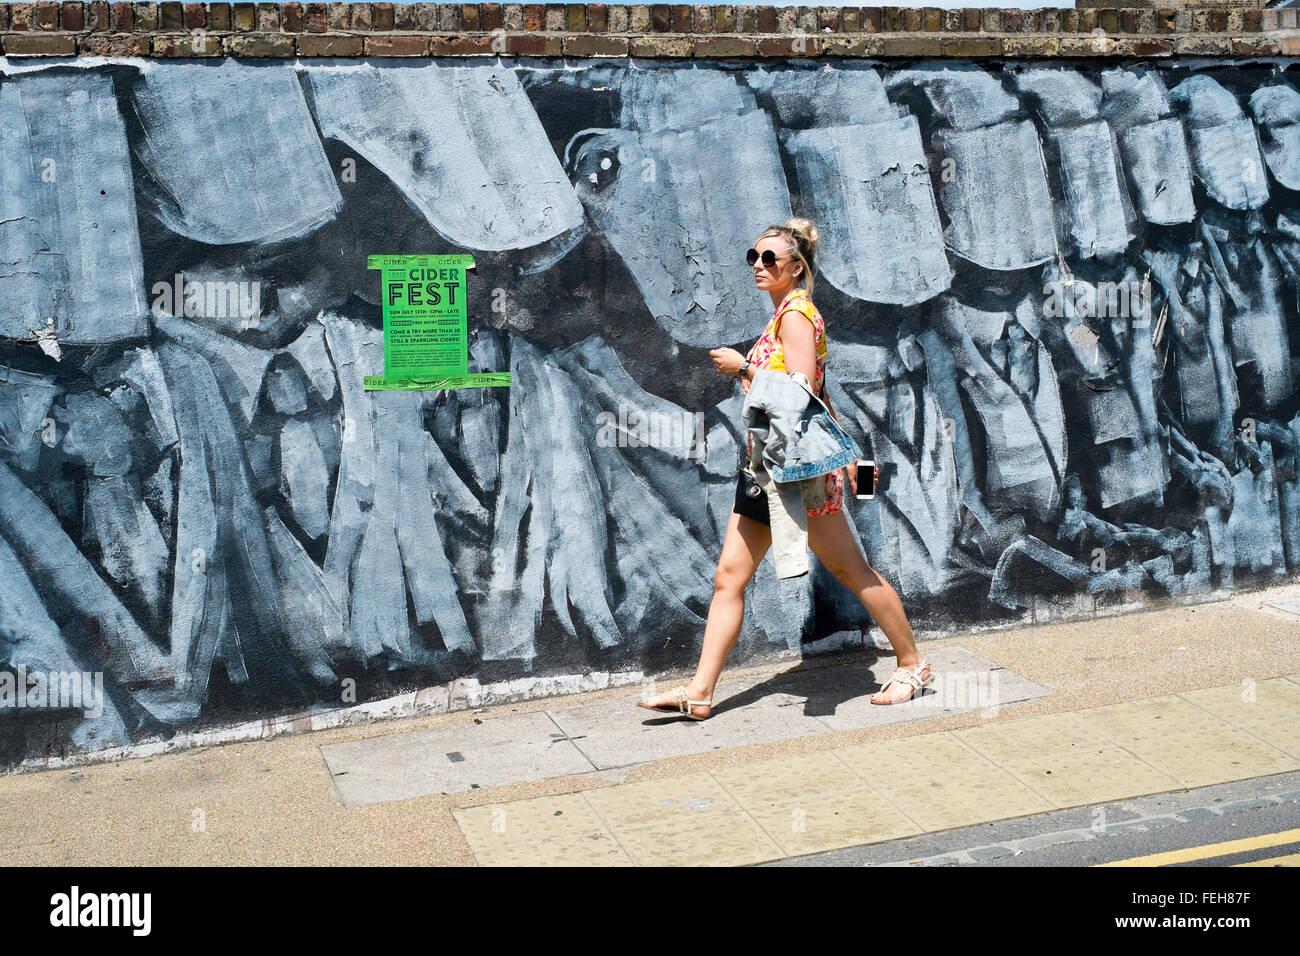 art arty wall graffiti urban Hackney London sidewalk - Stock Image